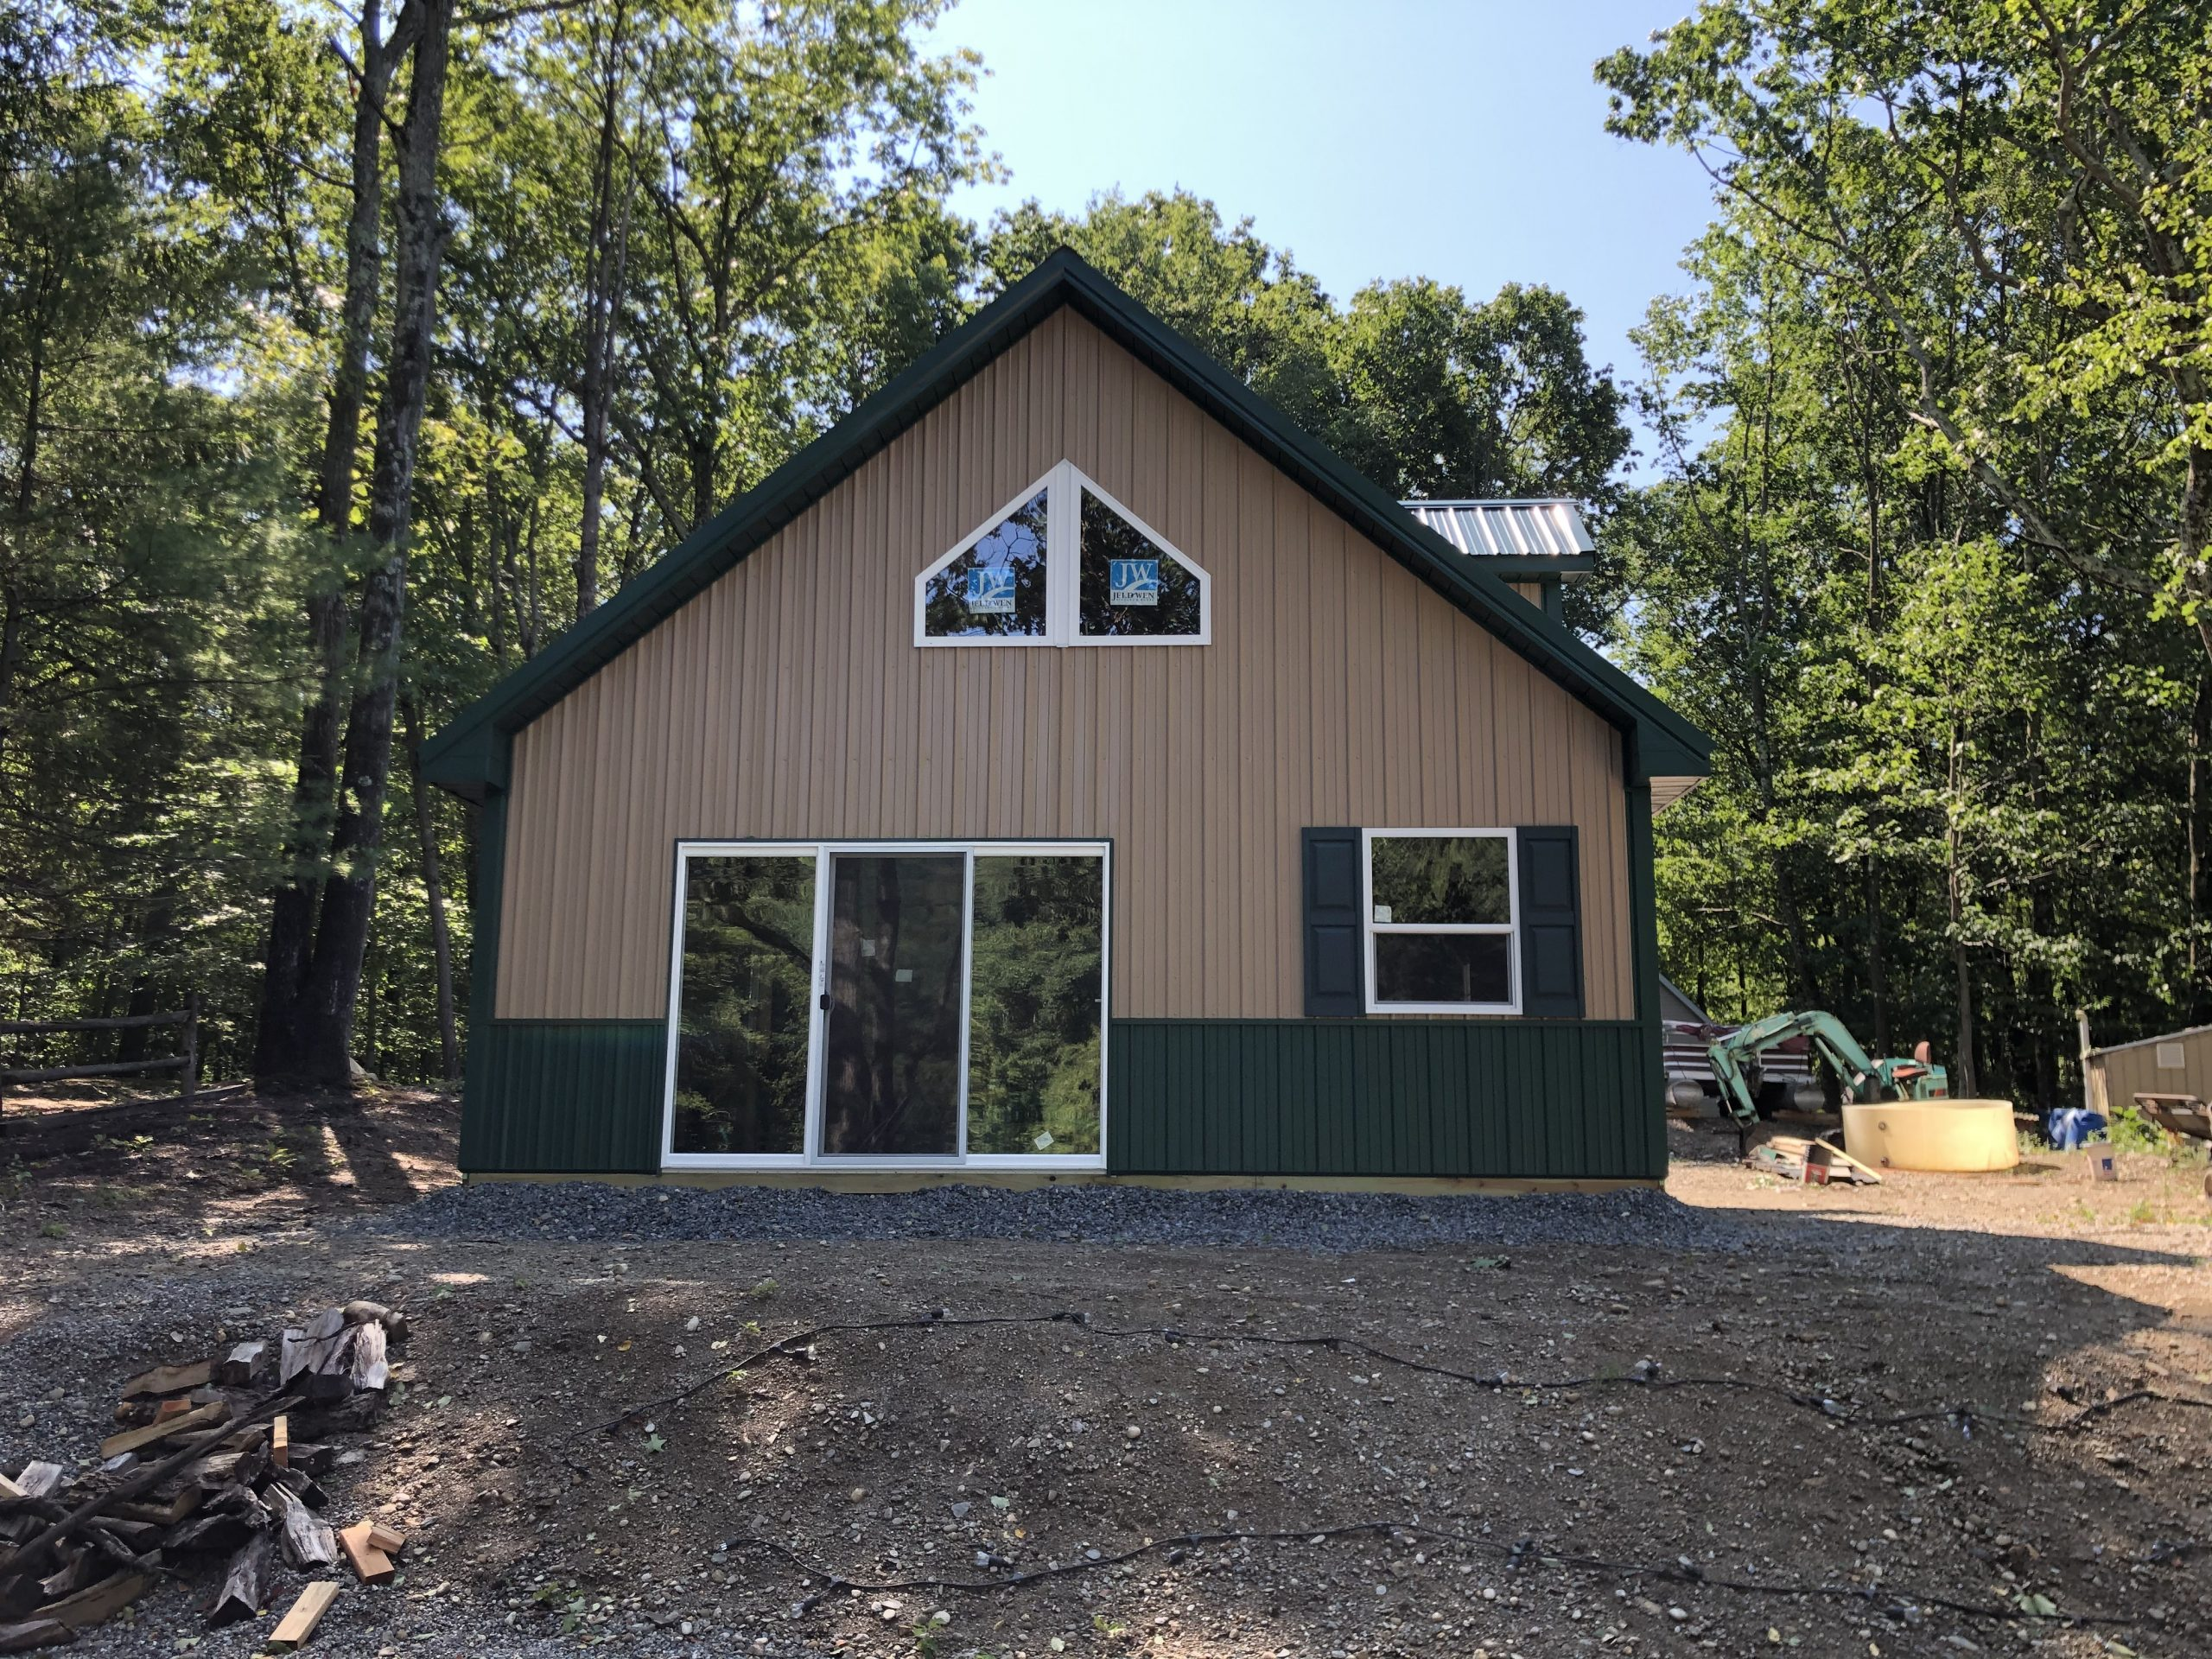 green and tan new pole barn home